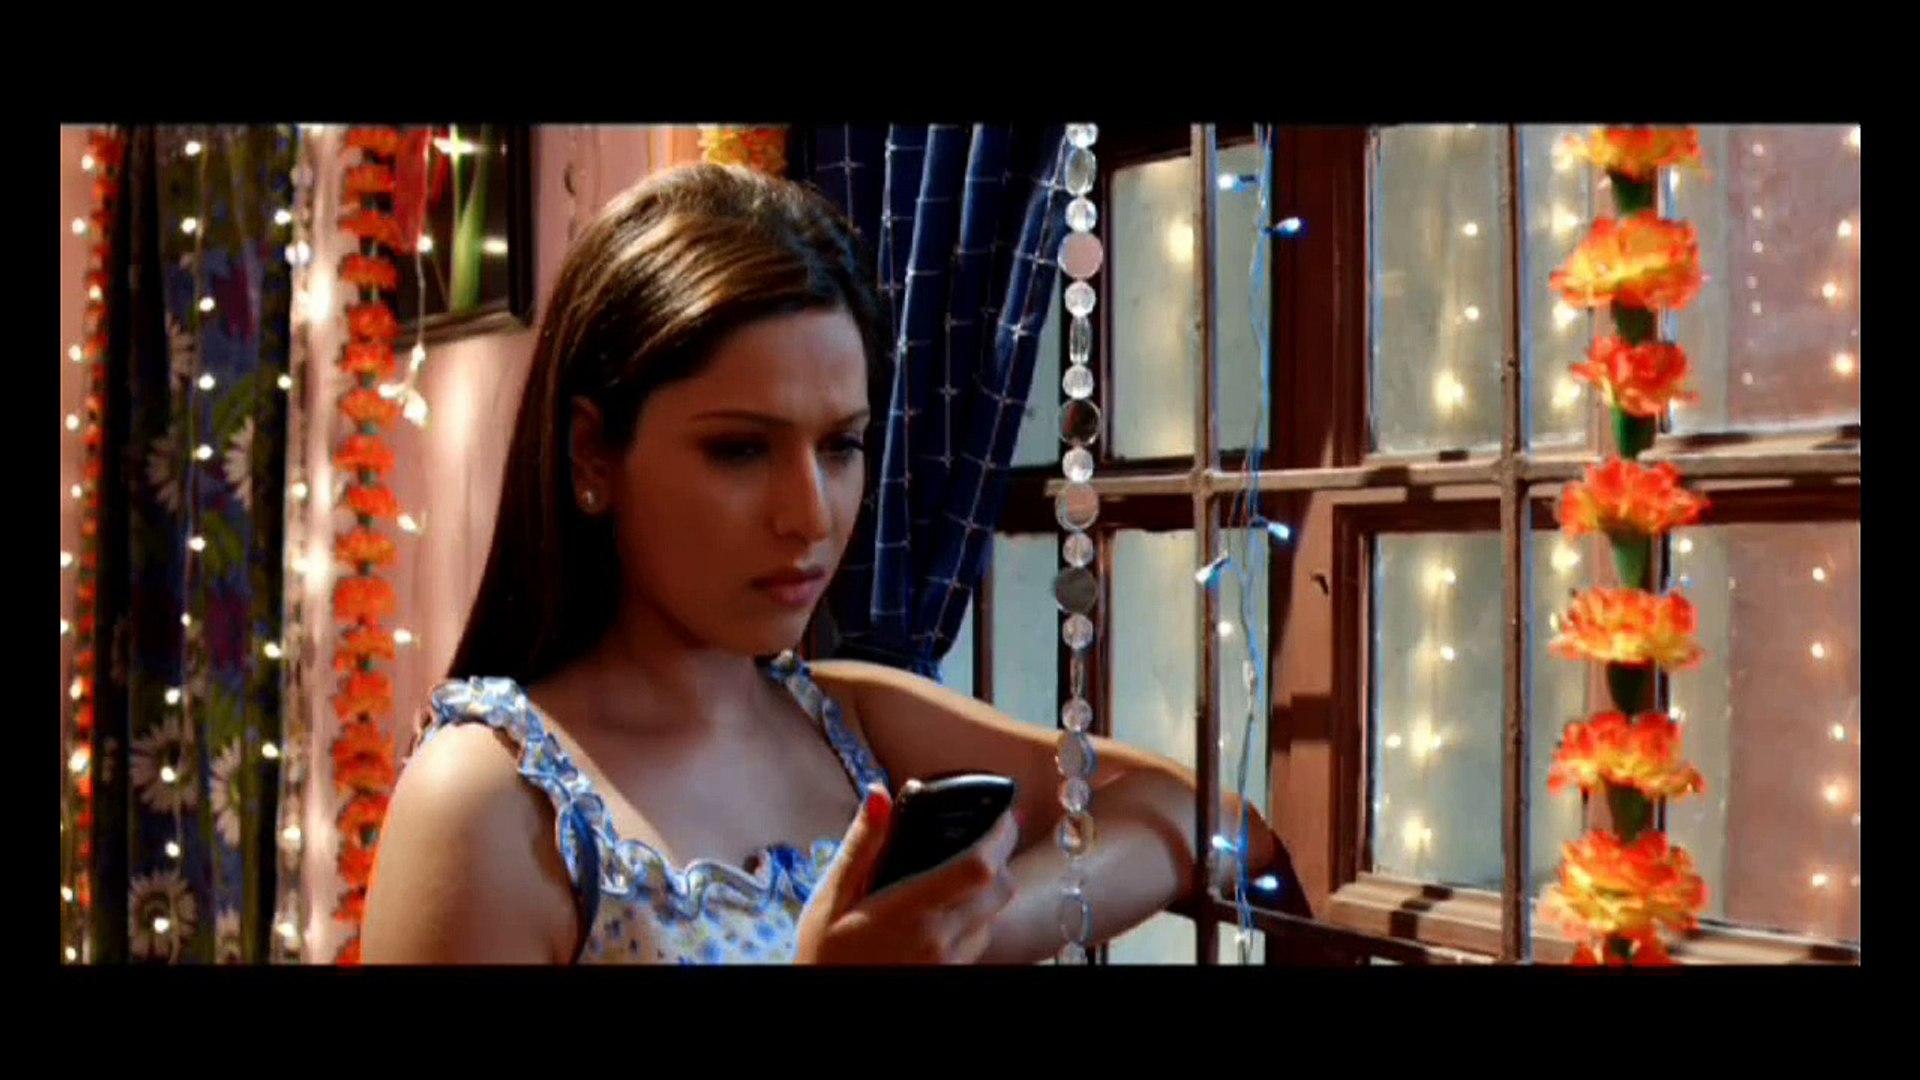 Dil Ne Badi Shiddat Se - Song - Movie: Tere Ishq Mein Qurbaan - Singers: Shahid Malya, Madhushree